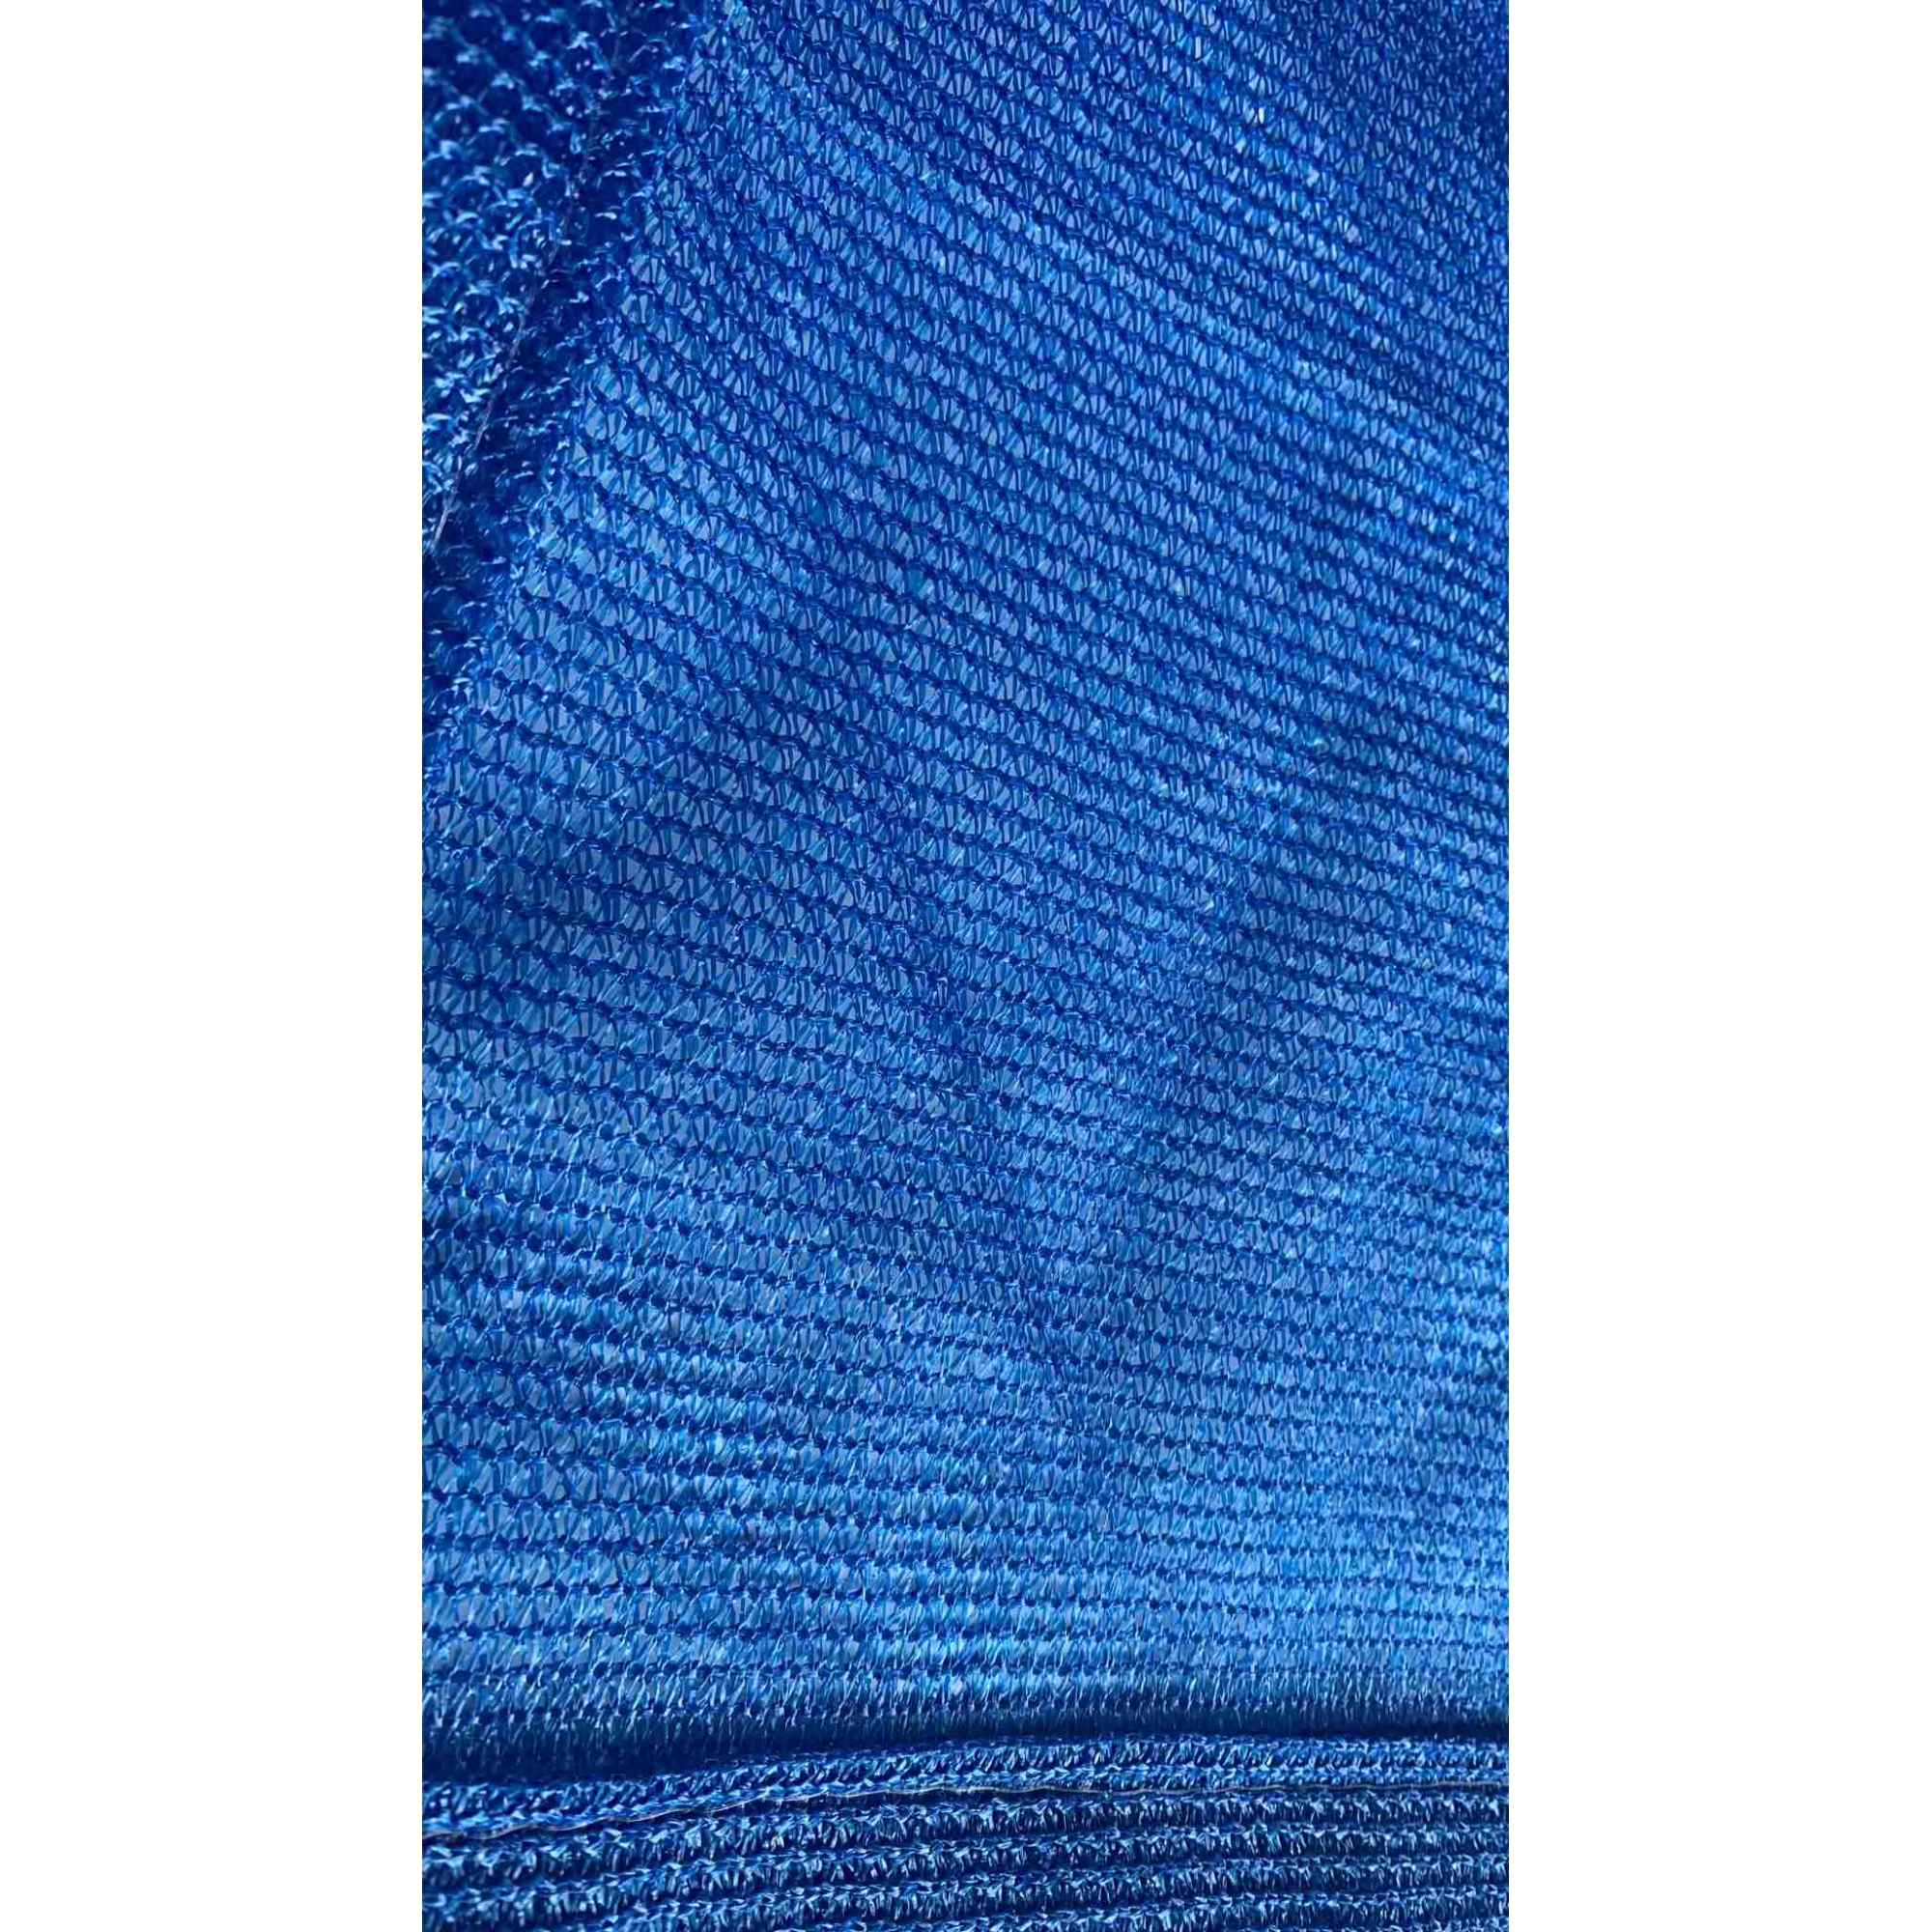 Tela de Sombreamento 80% Azul com Esticadores - Largura: 2,5 Metros